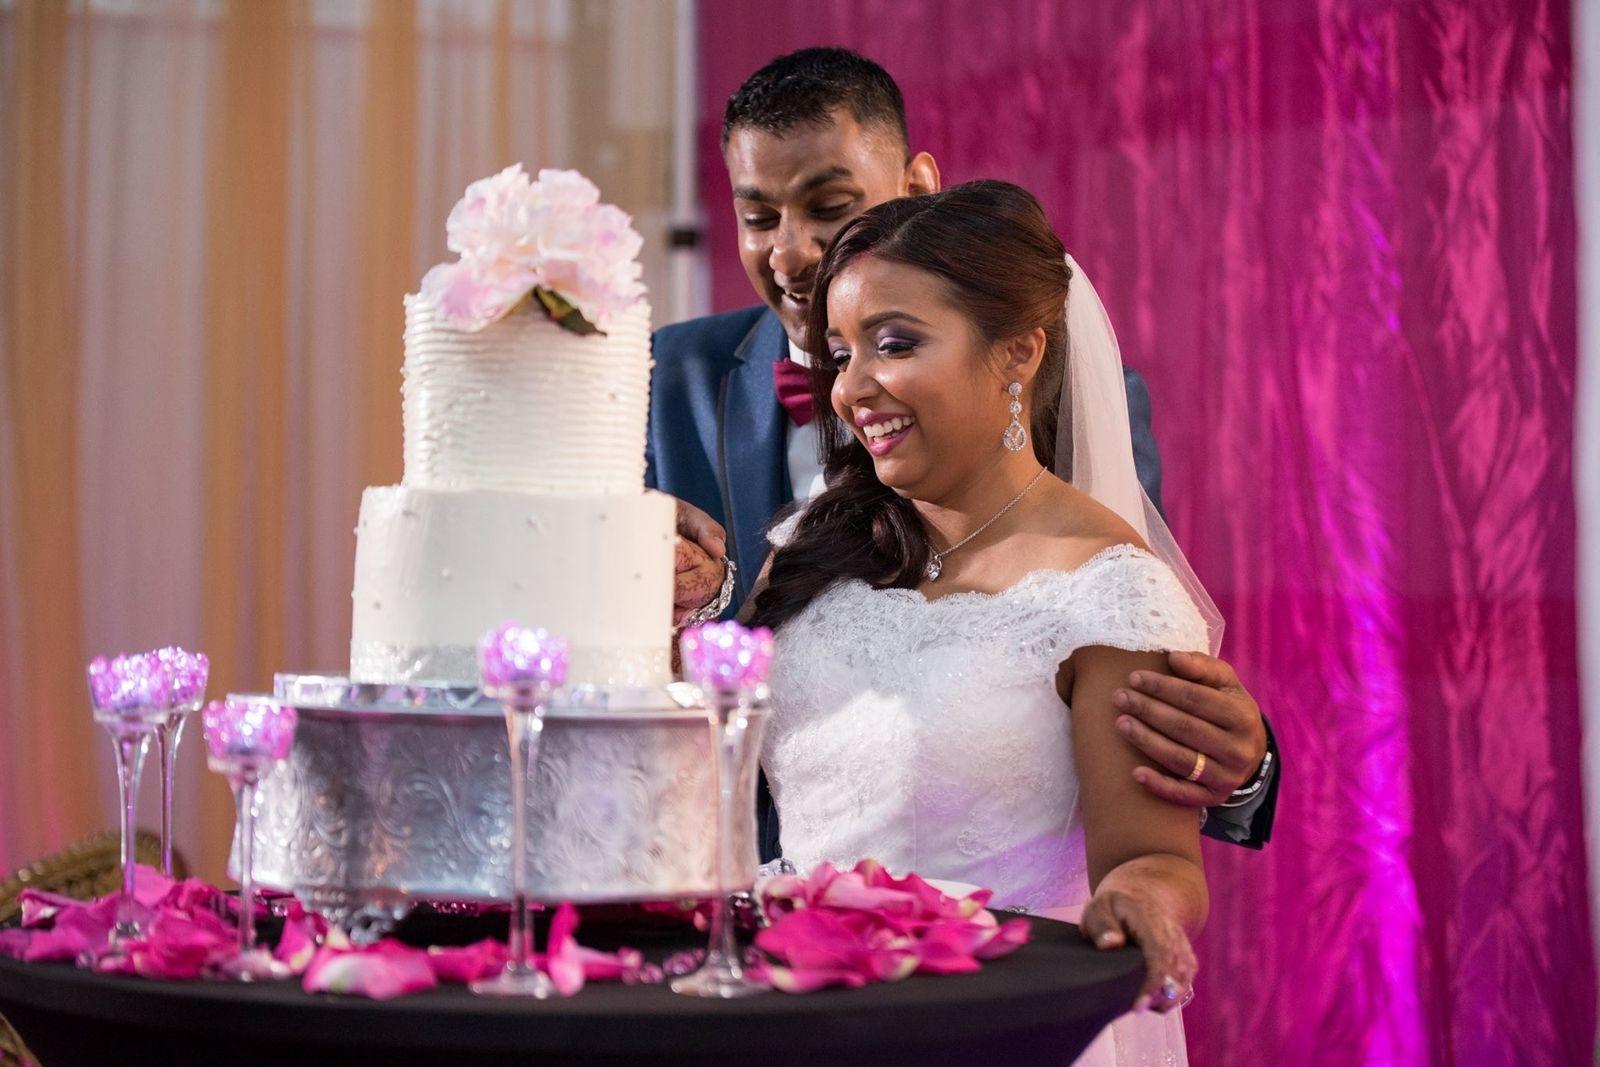 CozyImageGallery in 2020 Luxury wedding, Ceremony